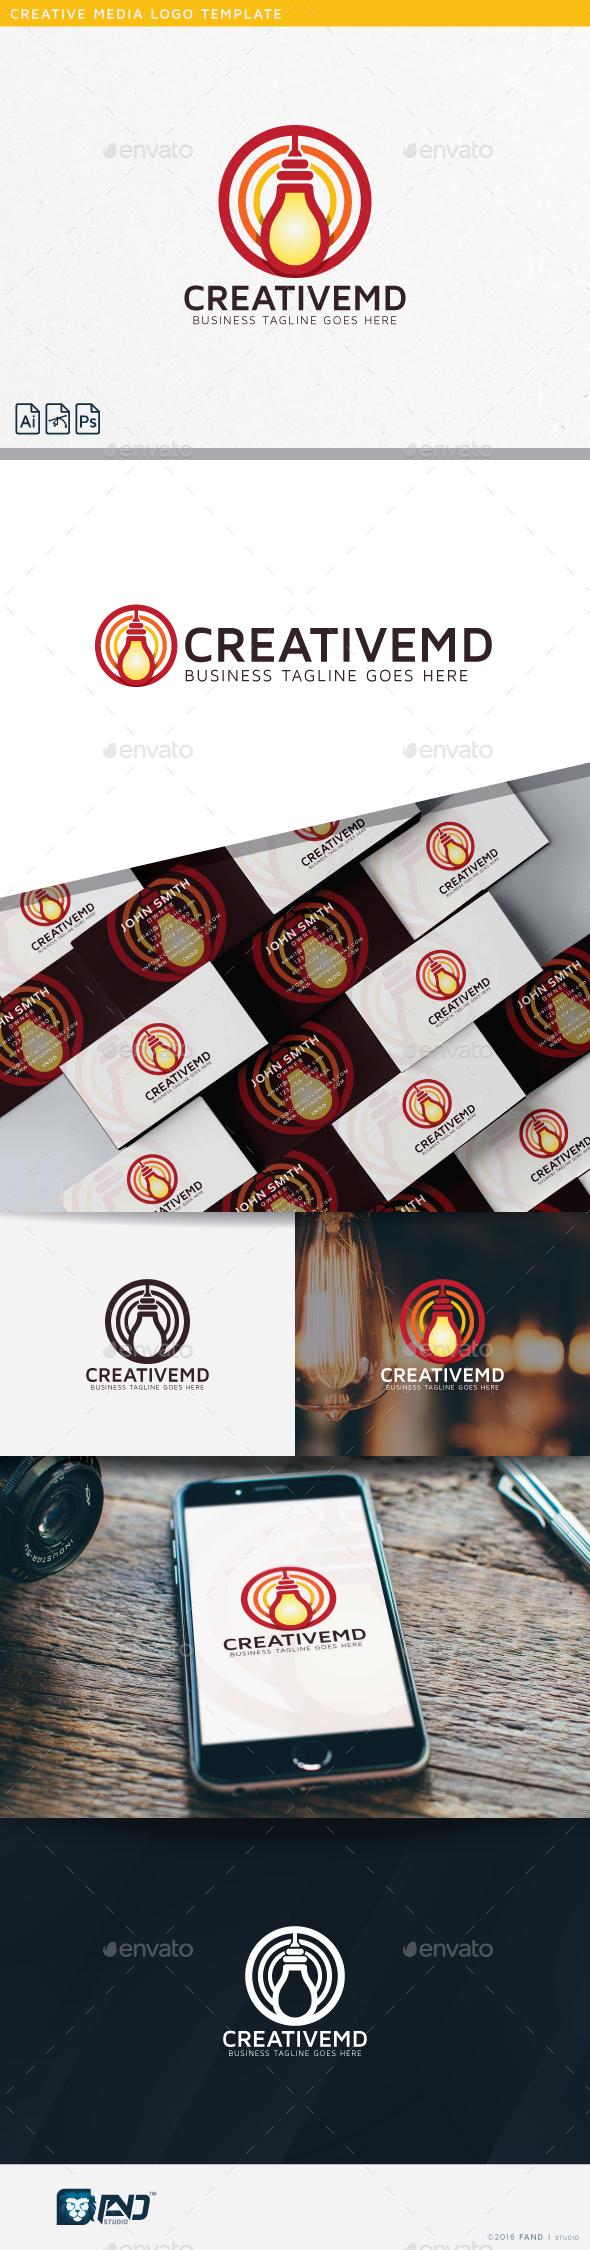 Creative Media - Symbols Logo Templates